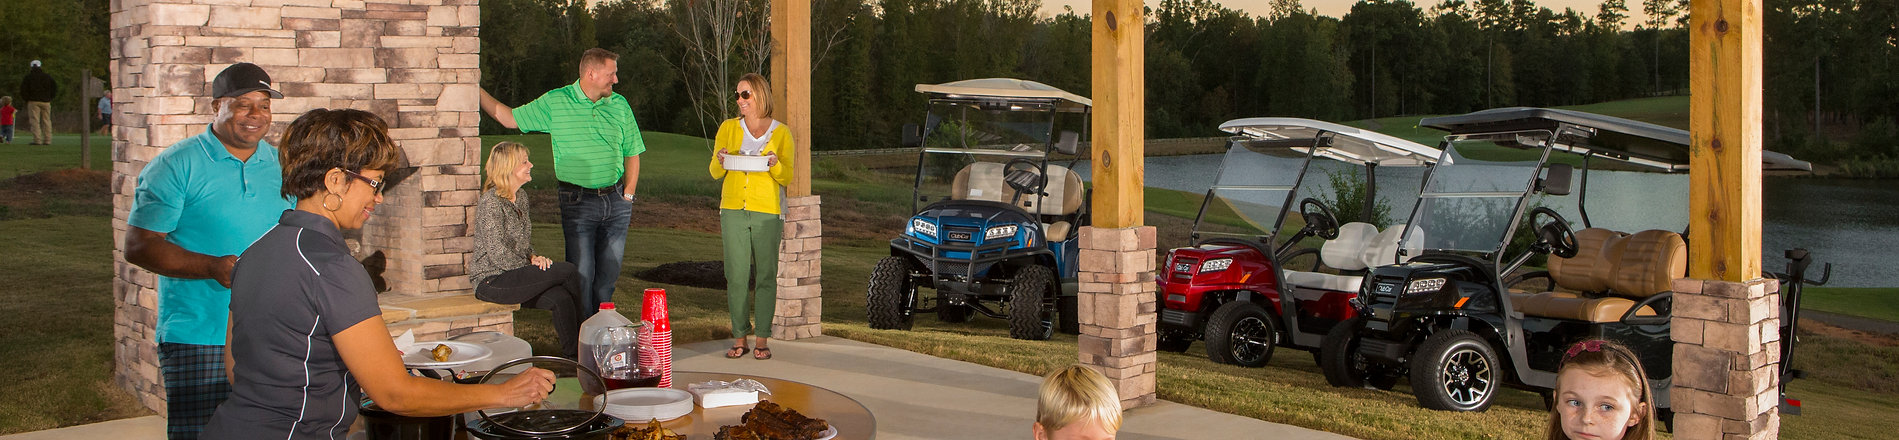 Club Car Golf Cart Cook Out